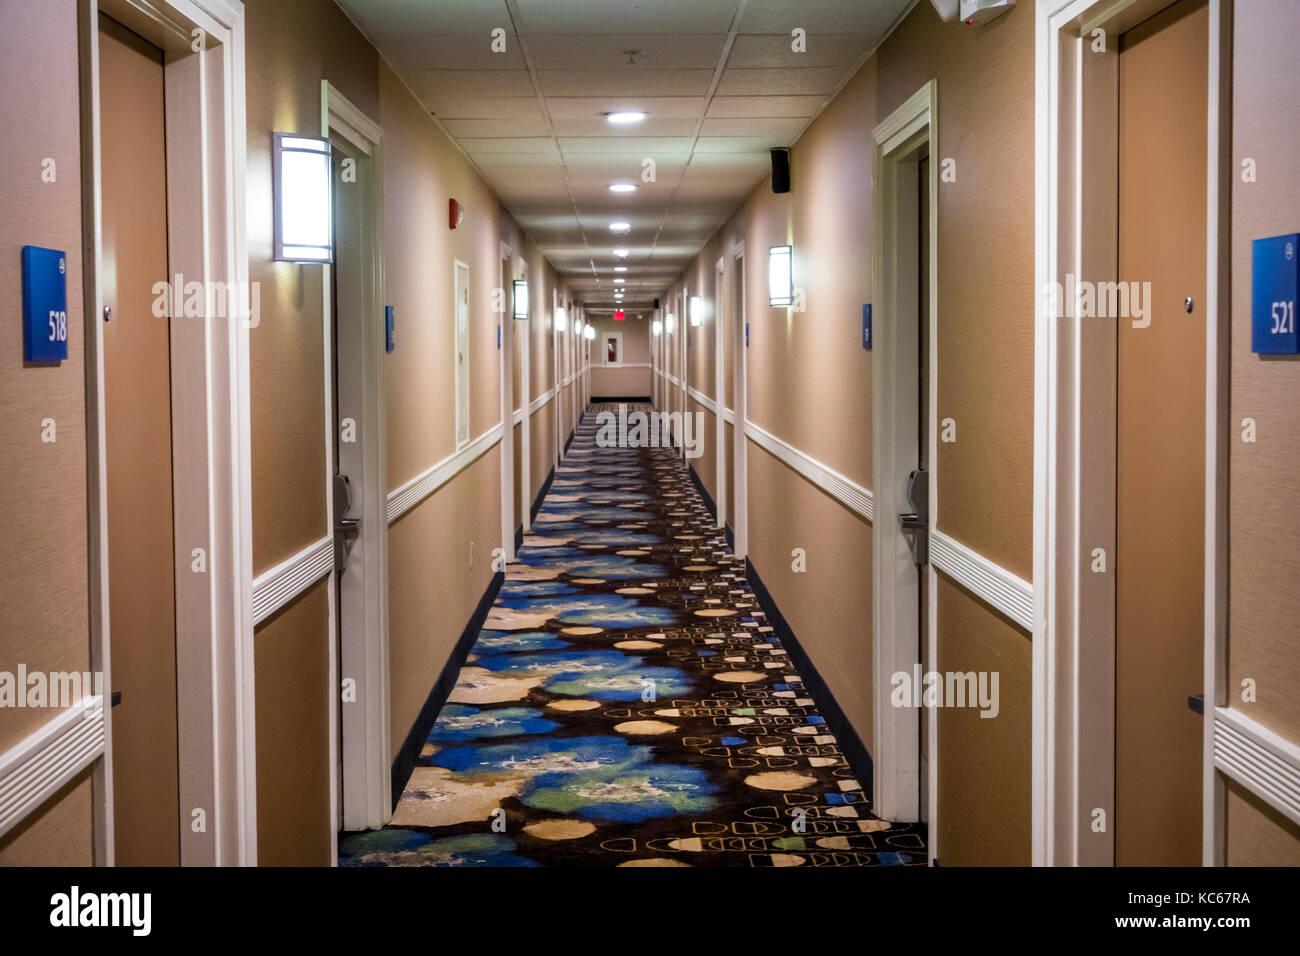 Silver Spring Maryland Holiday Inn Express hotel hallway hall room doors interior - Stock Image